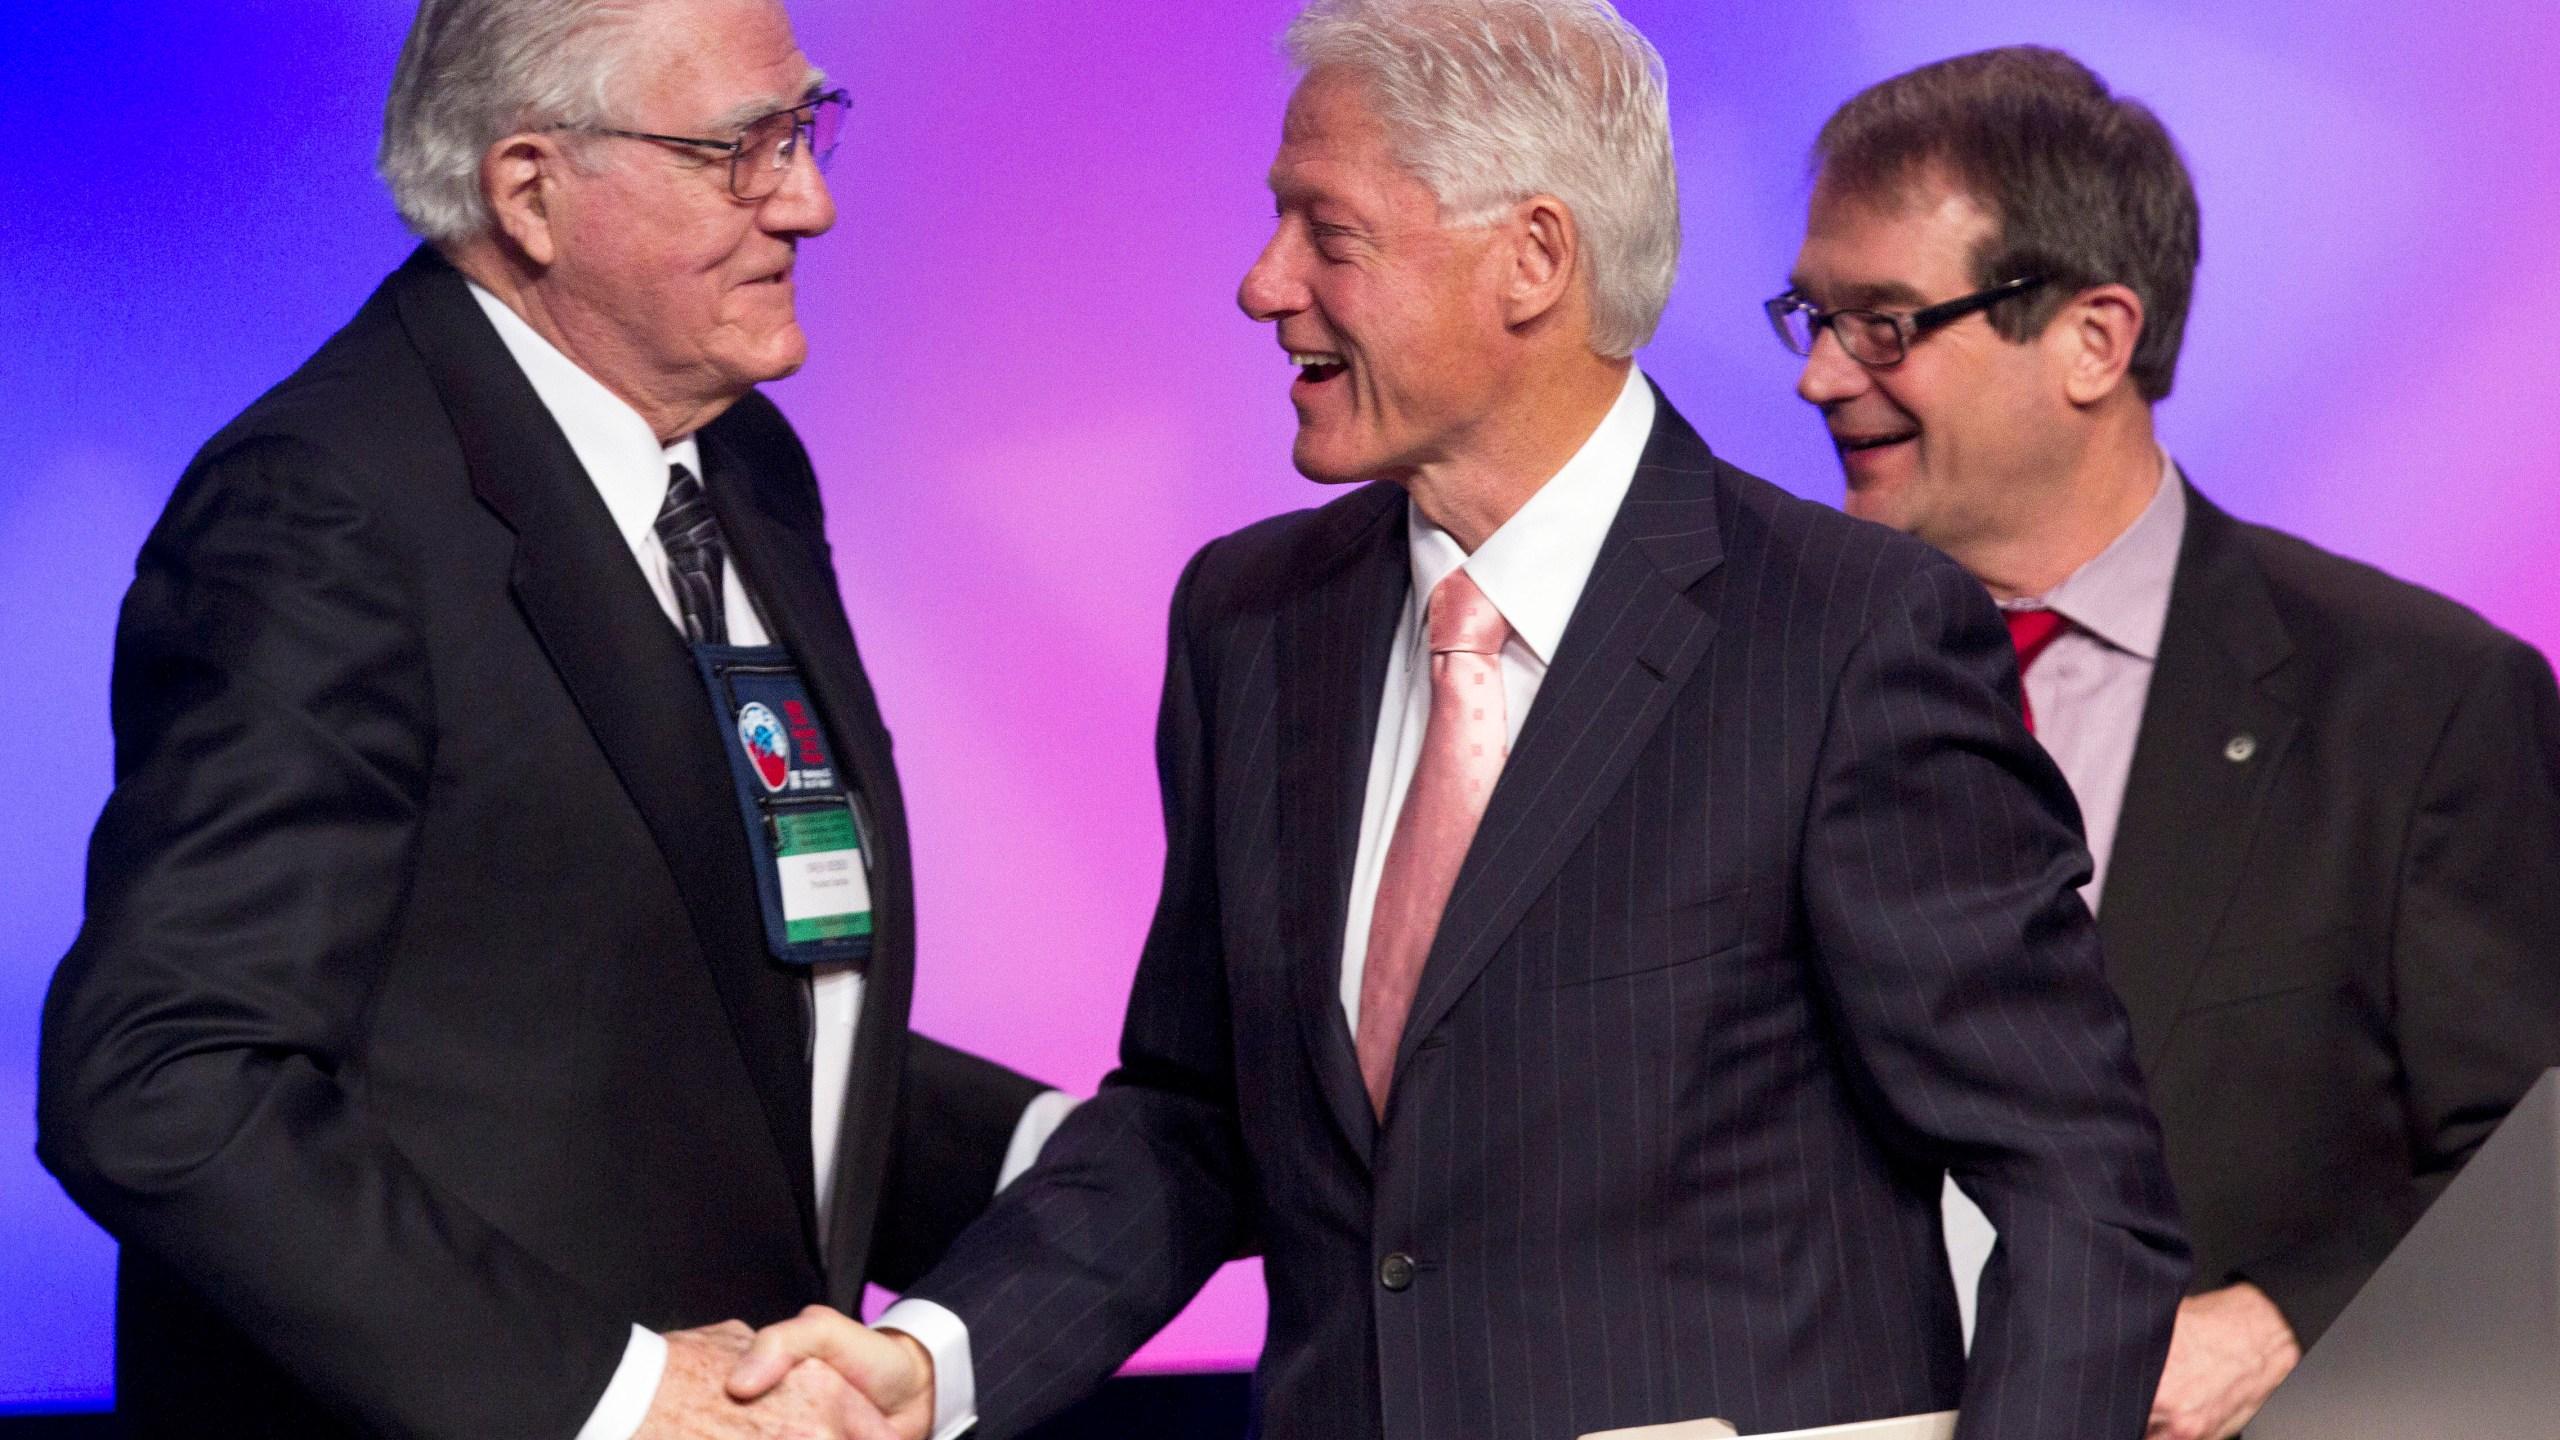 Bill Clinton, Bob King, Owen Bieber